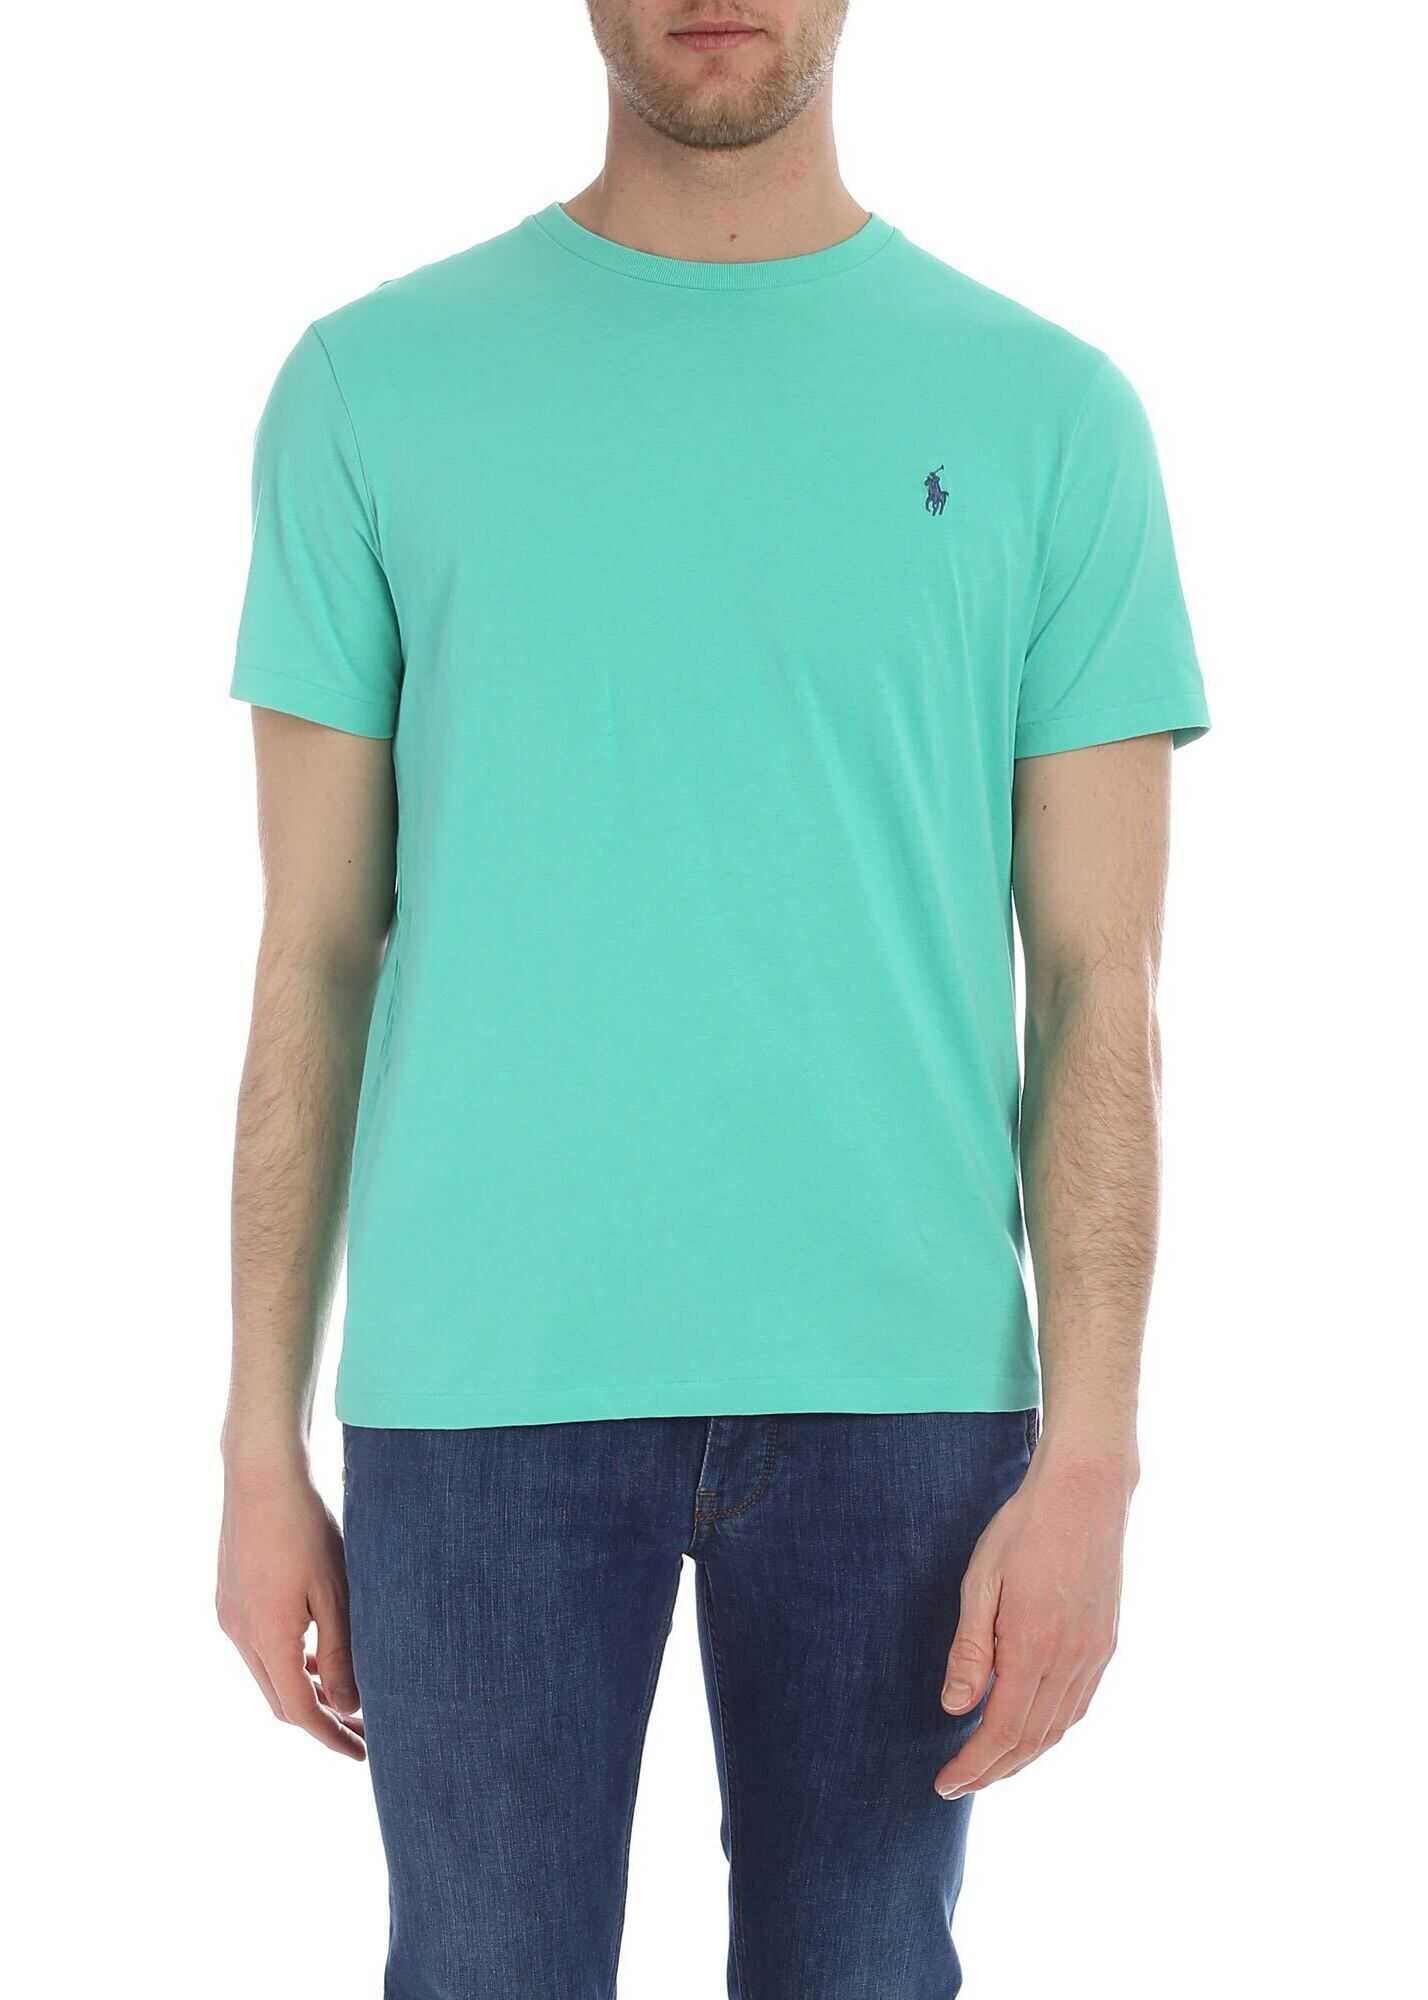 Ralph Lauren Custom Slim Fit T-Shirt In Mint Green Green